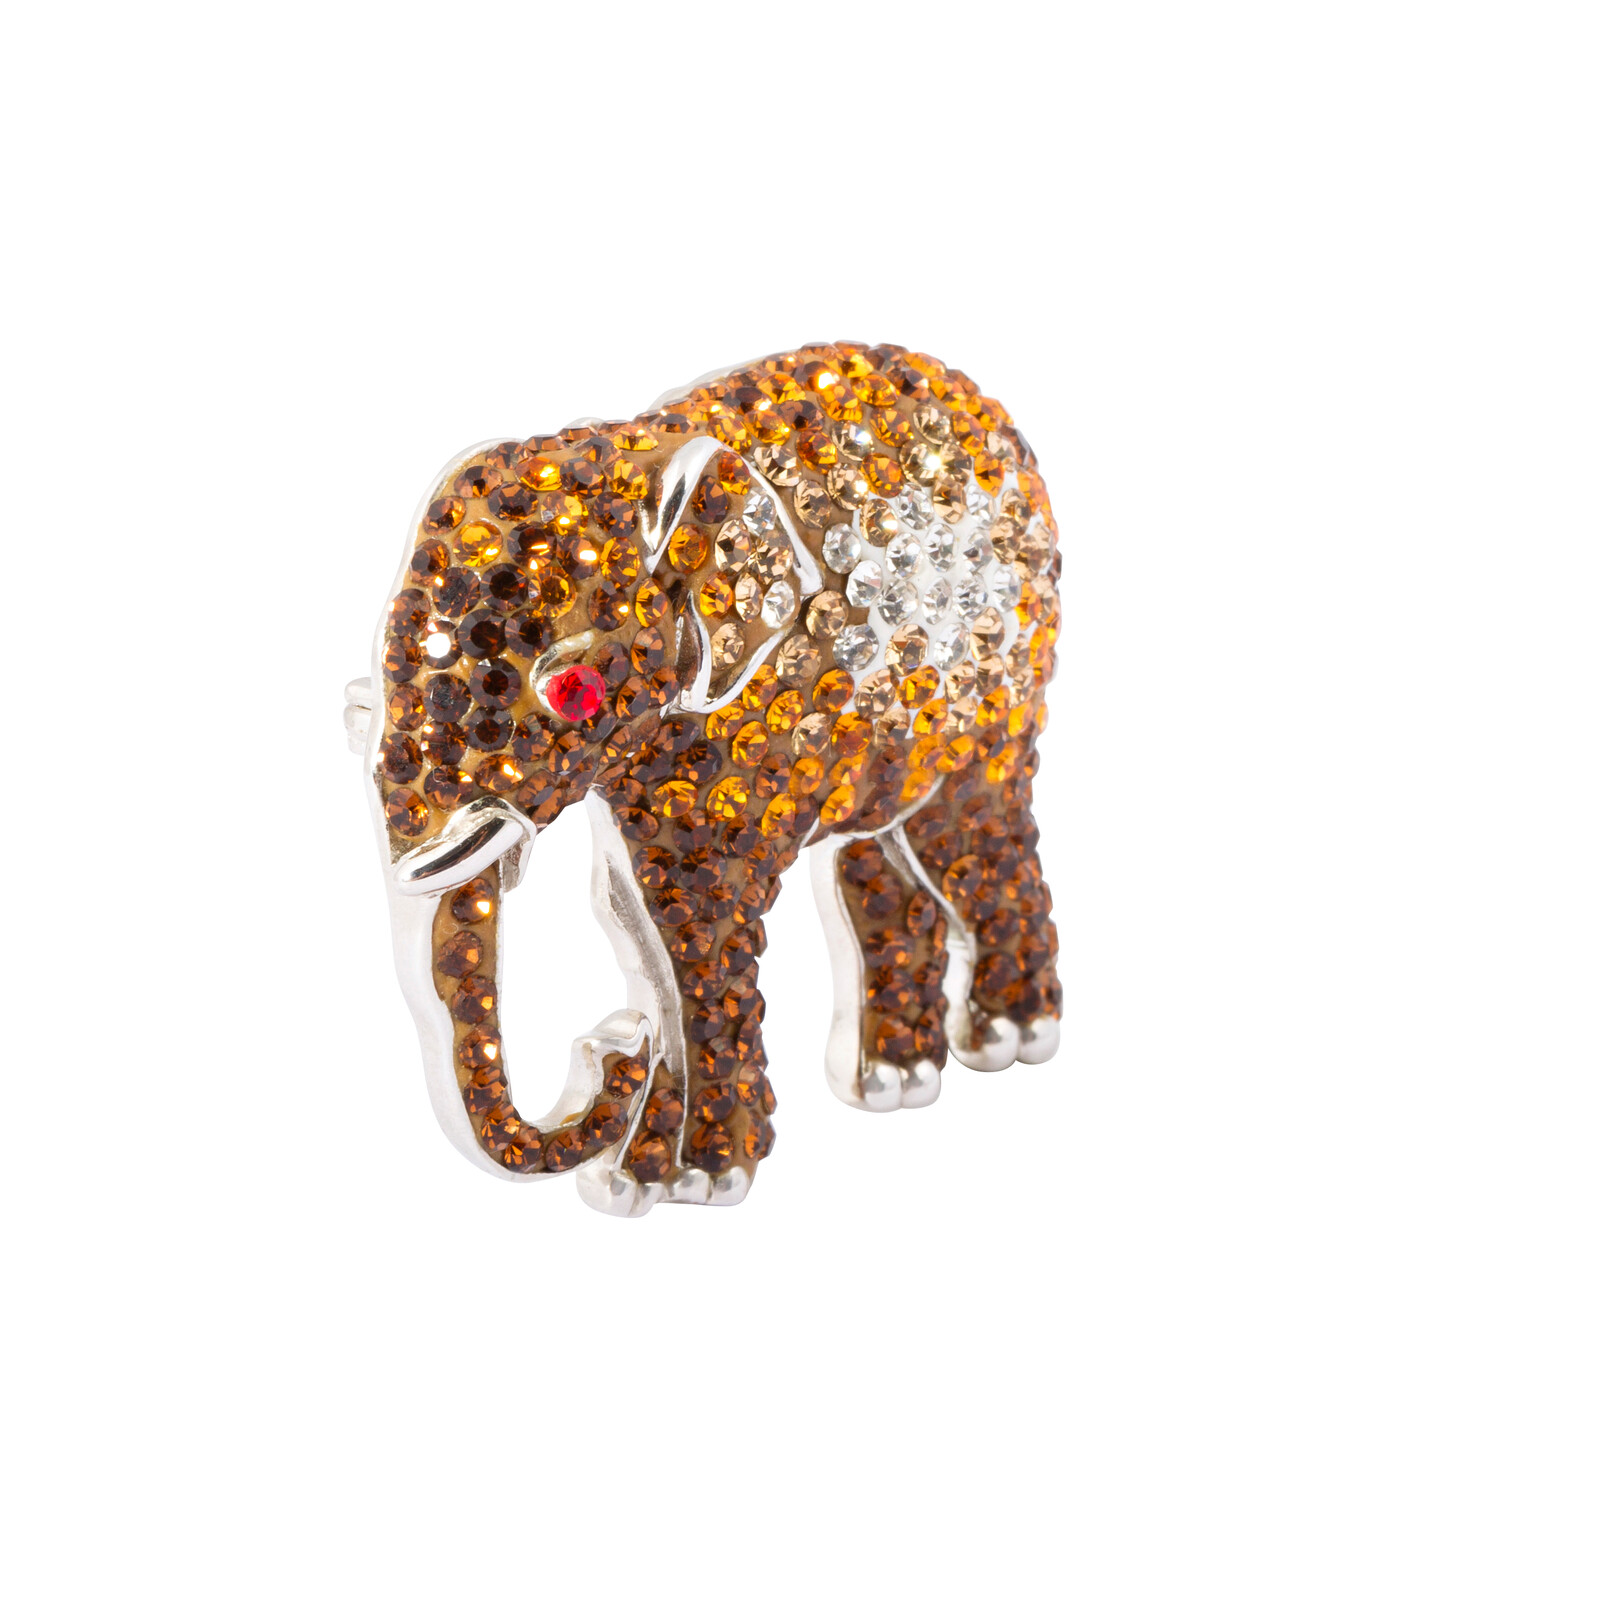 Brosche Elefant Swarovski Elements